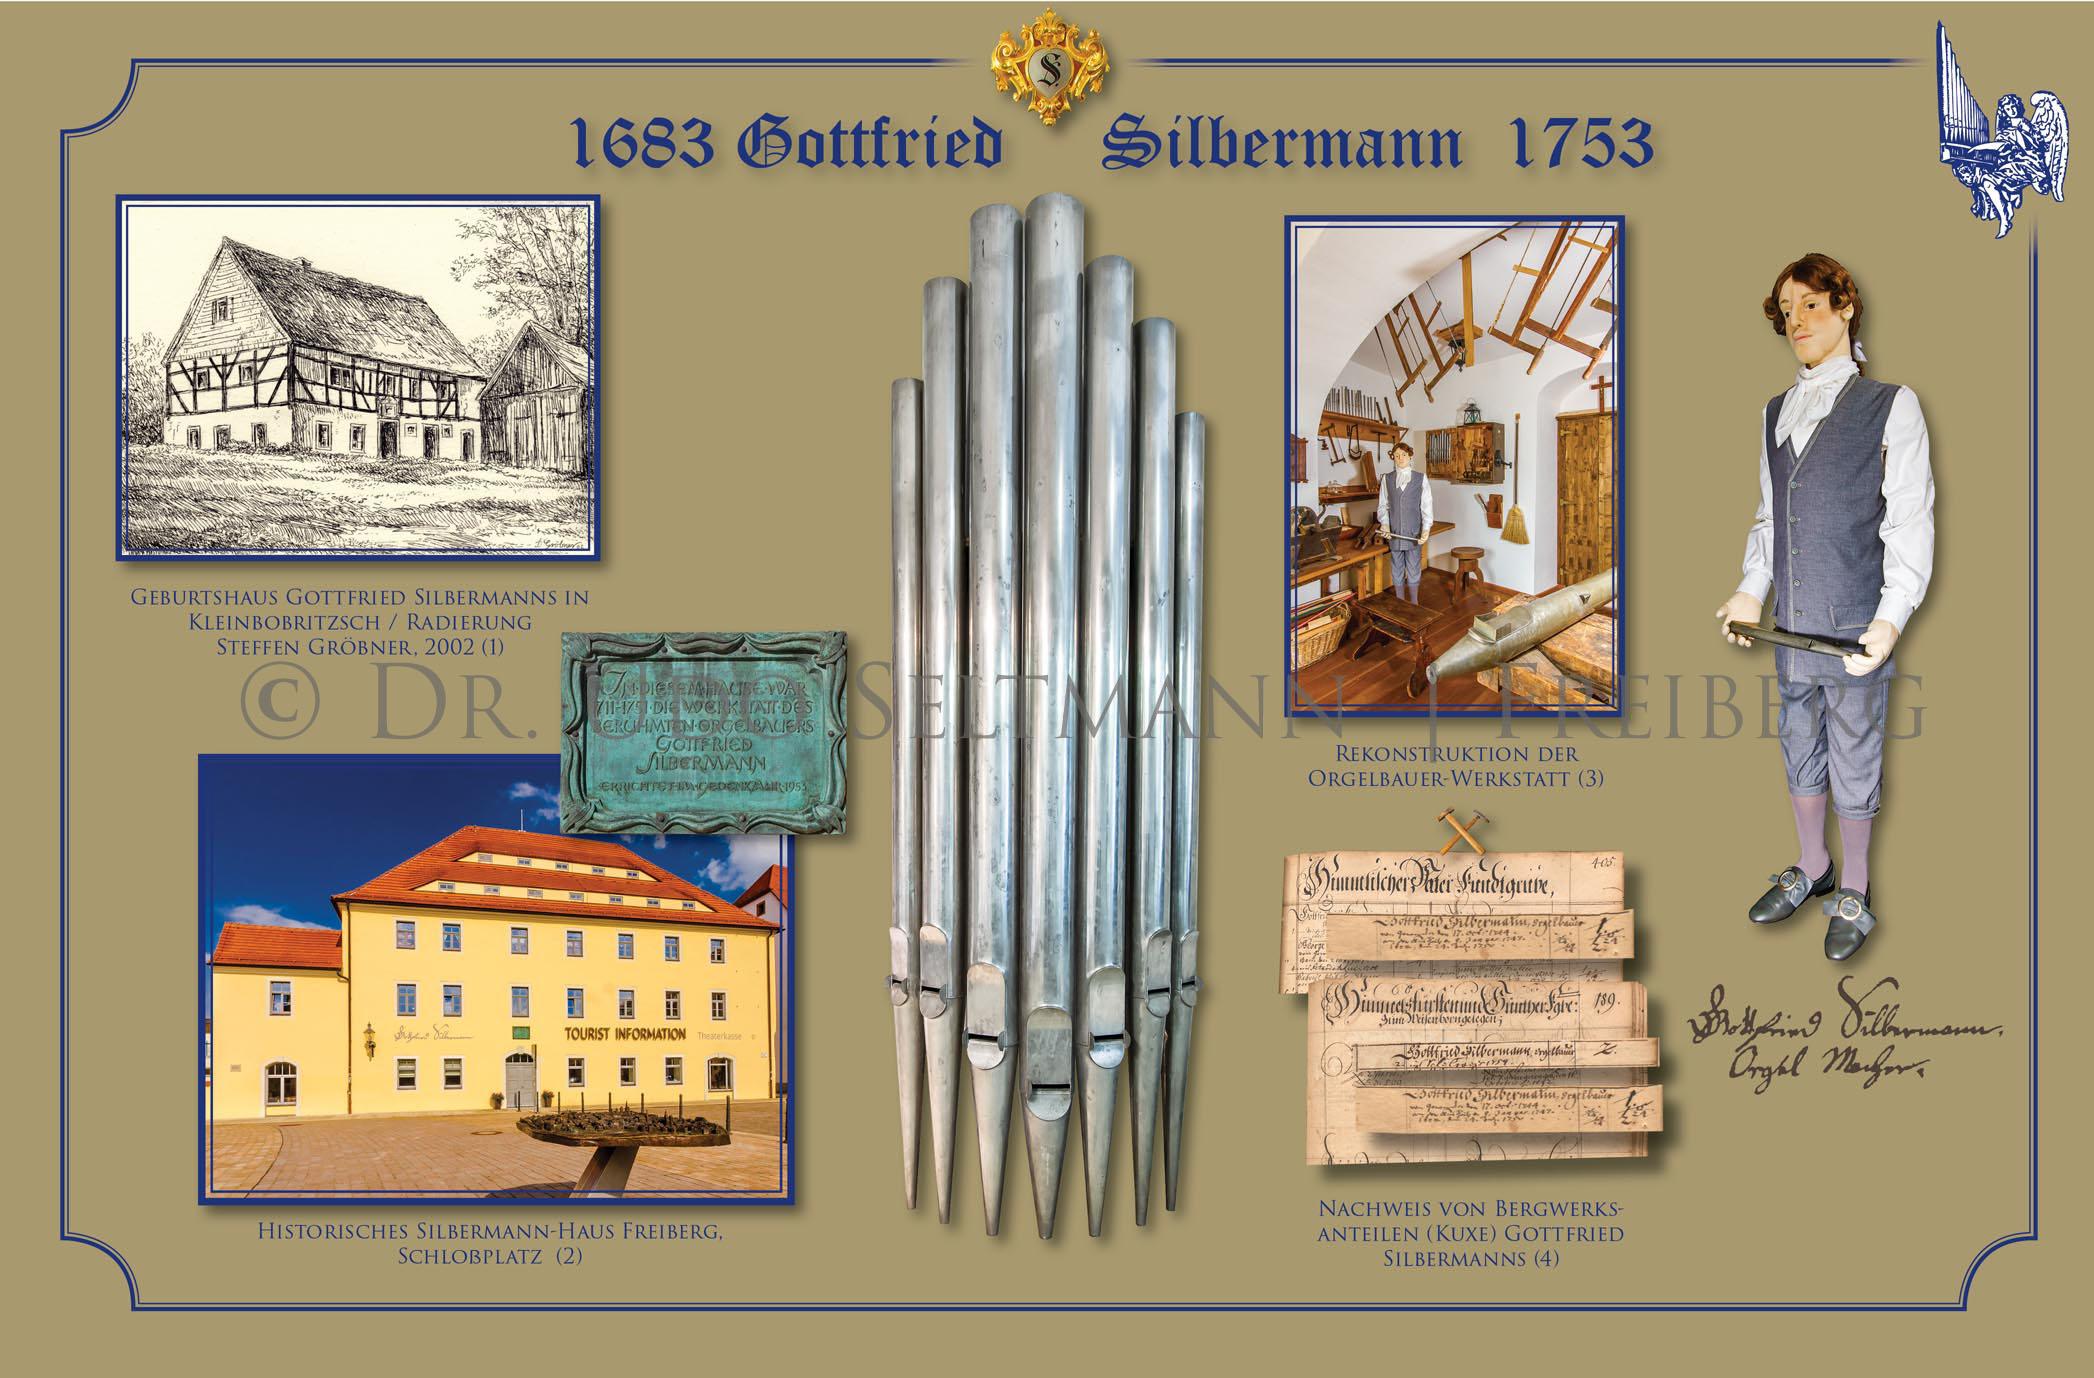 GK-Silbermann_Thubnail-USel_2017-08-16